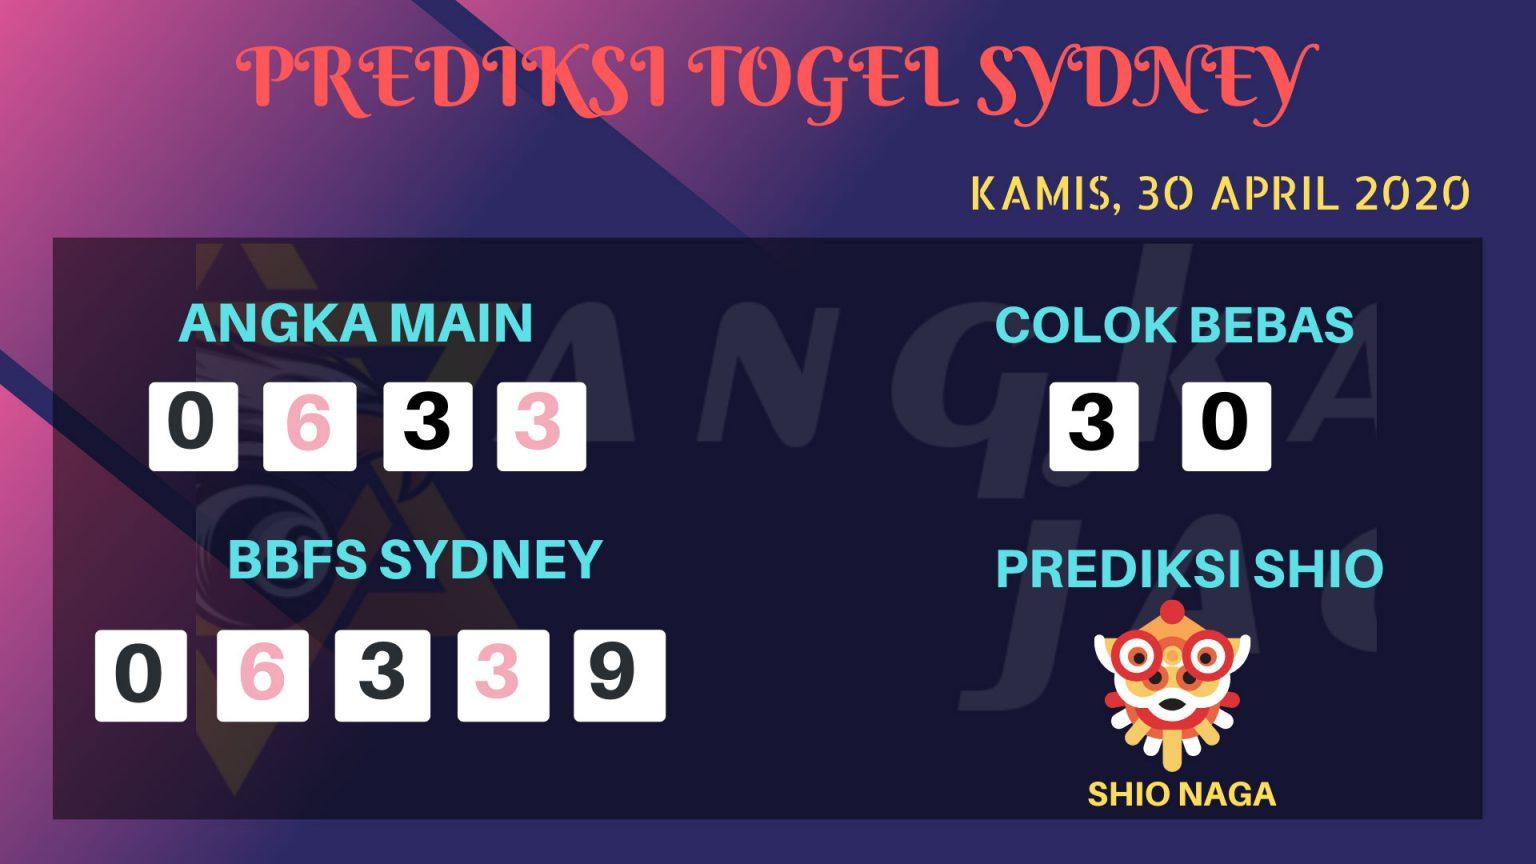 Prediksi Togel Sydney 30 April 2020 - Prediksi Angka Sydney